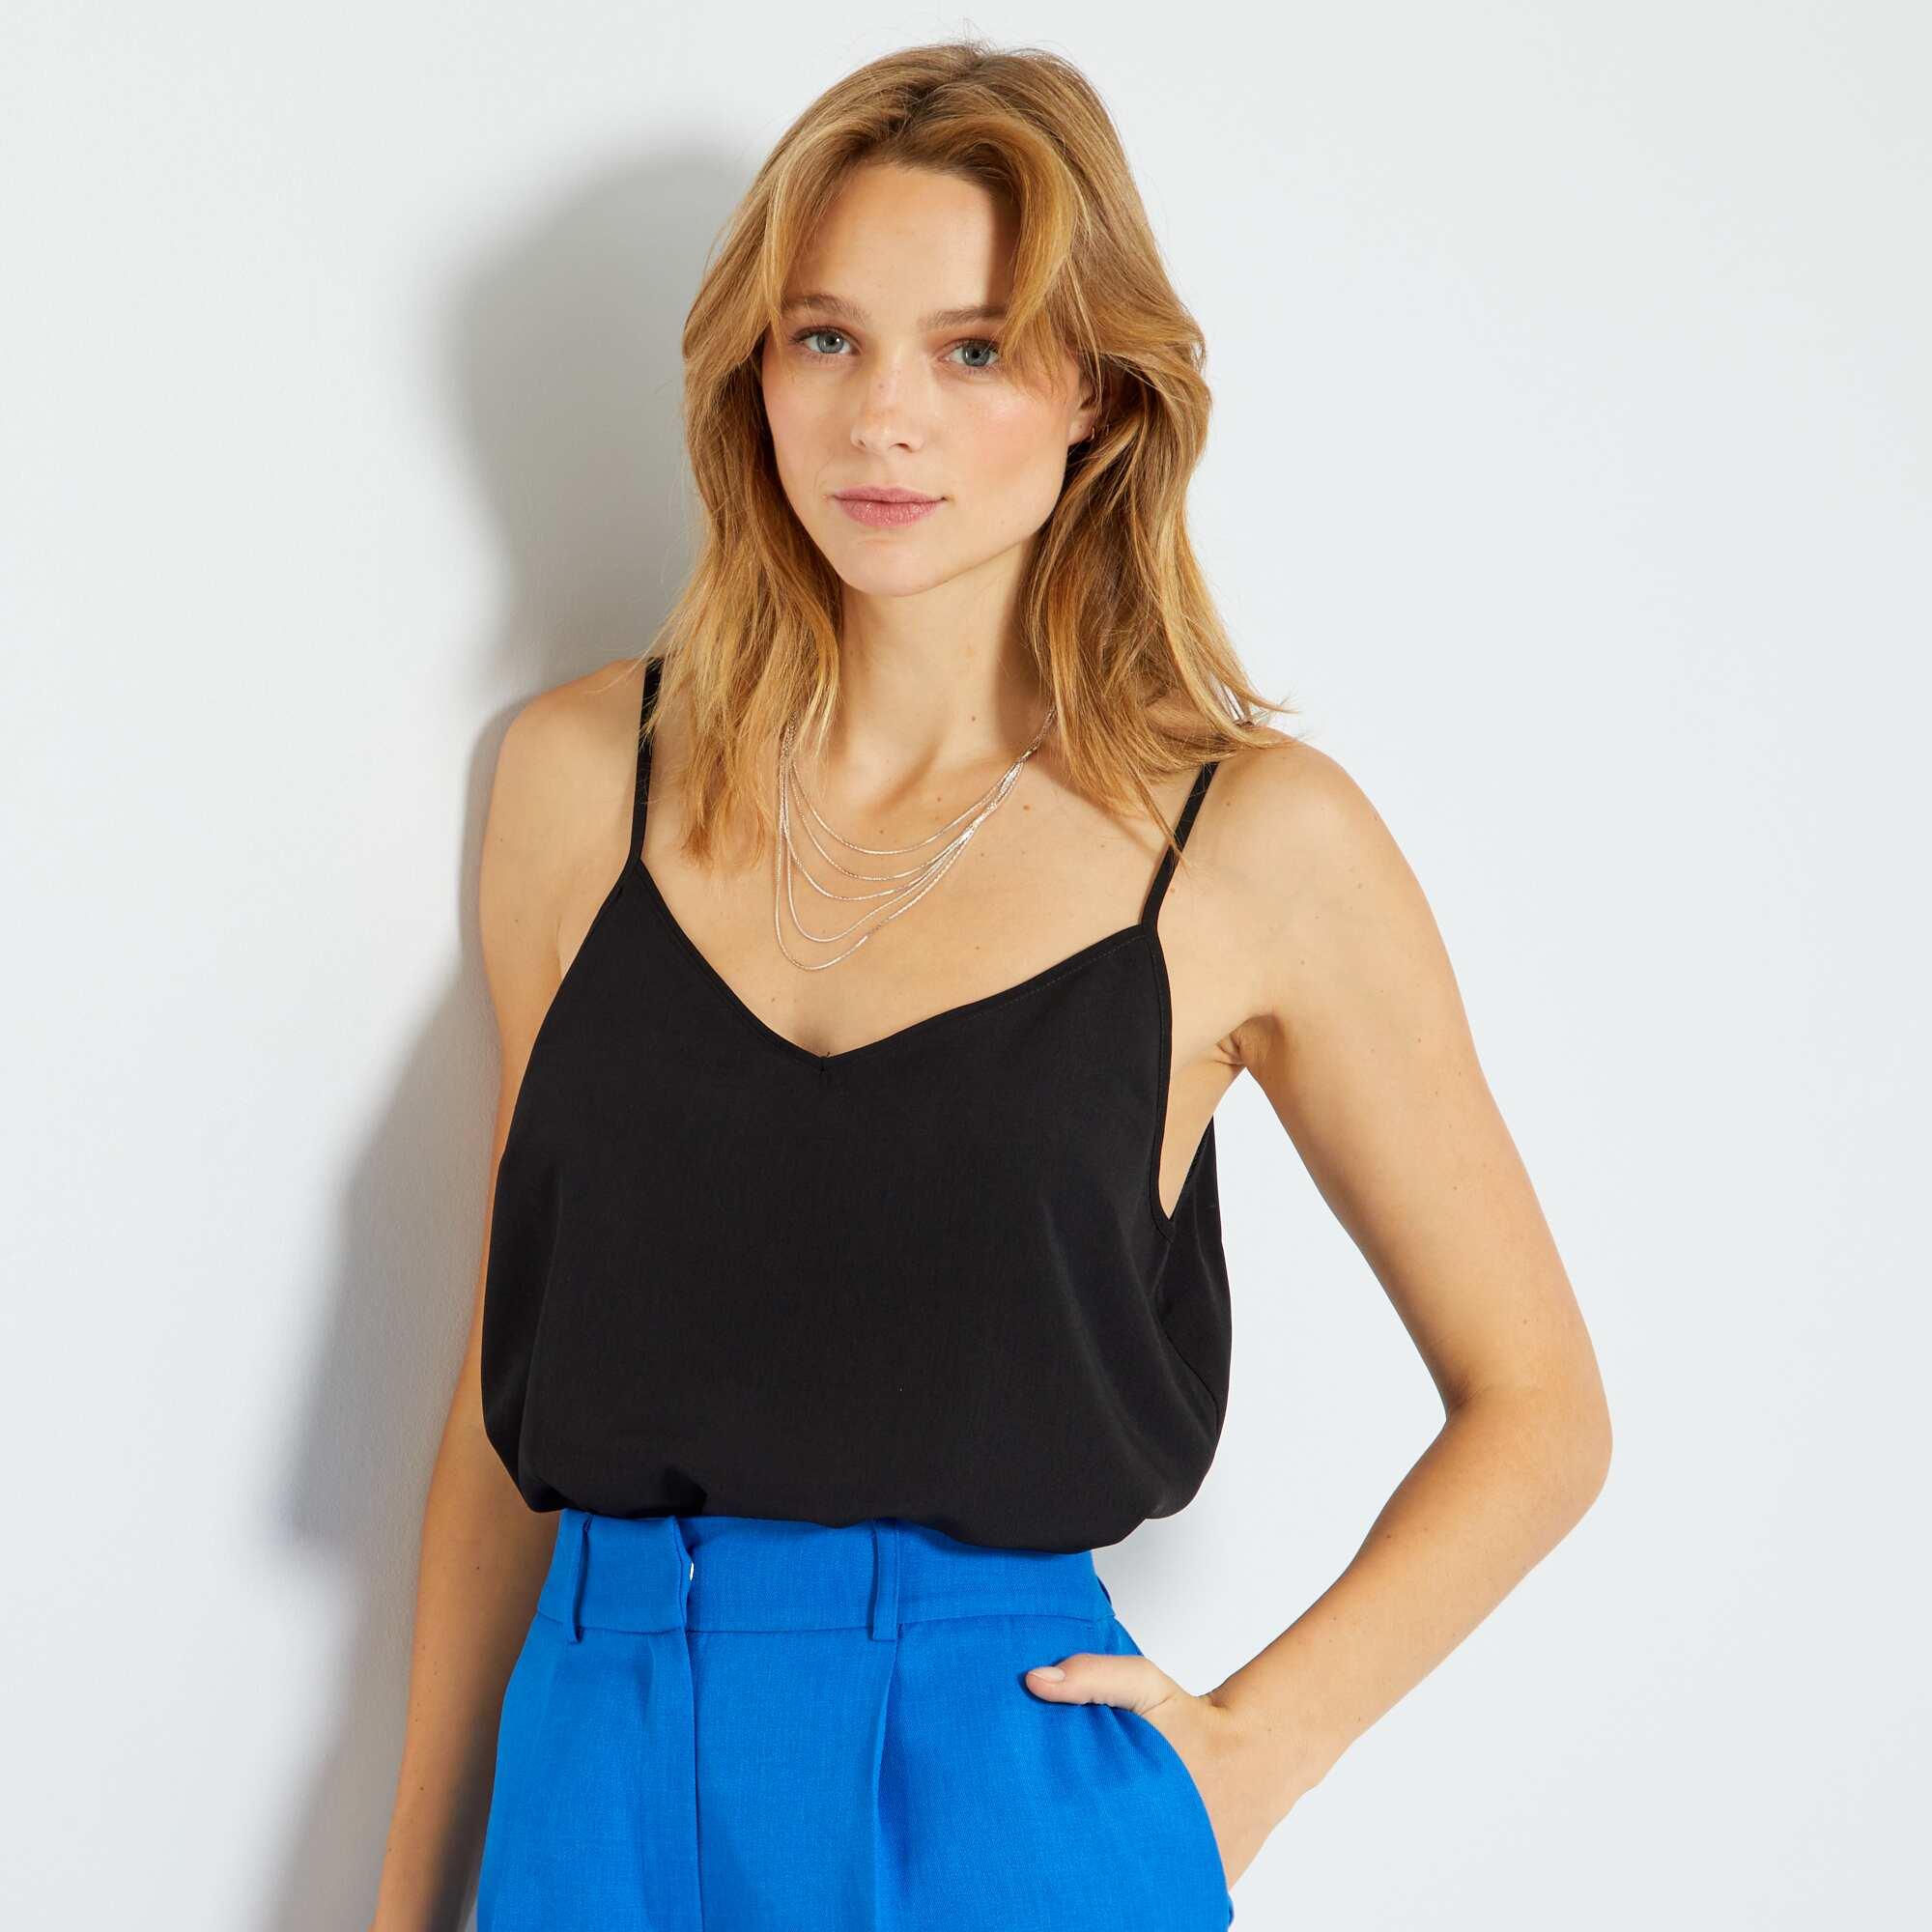 e8347a9a127 Top fines bretelles Femme - noir - Kiabi - 5